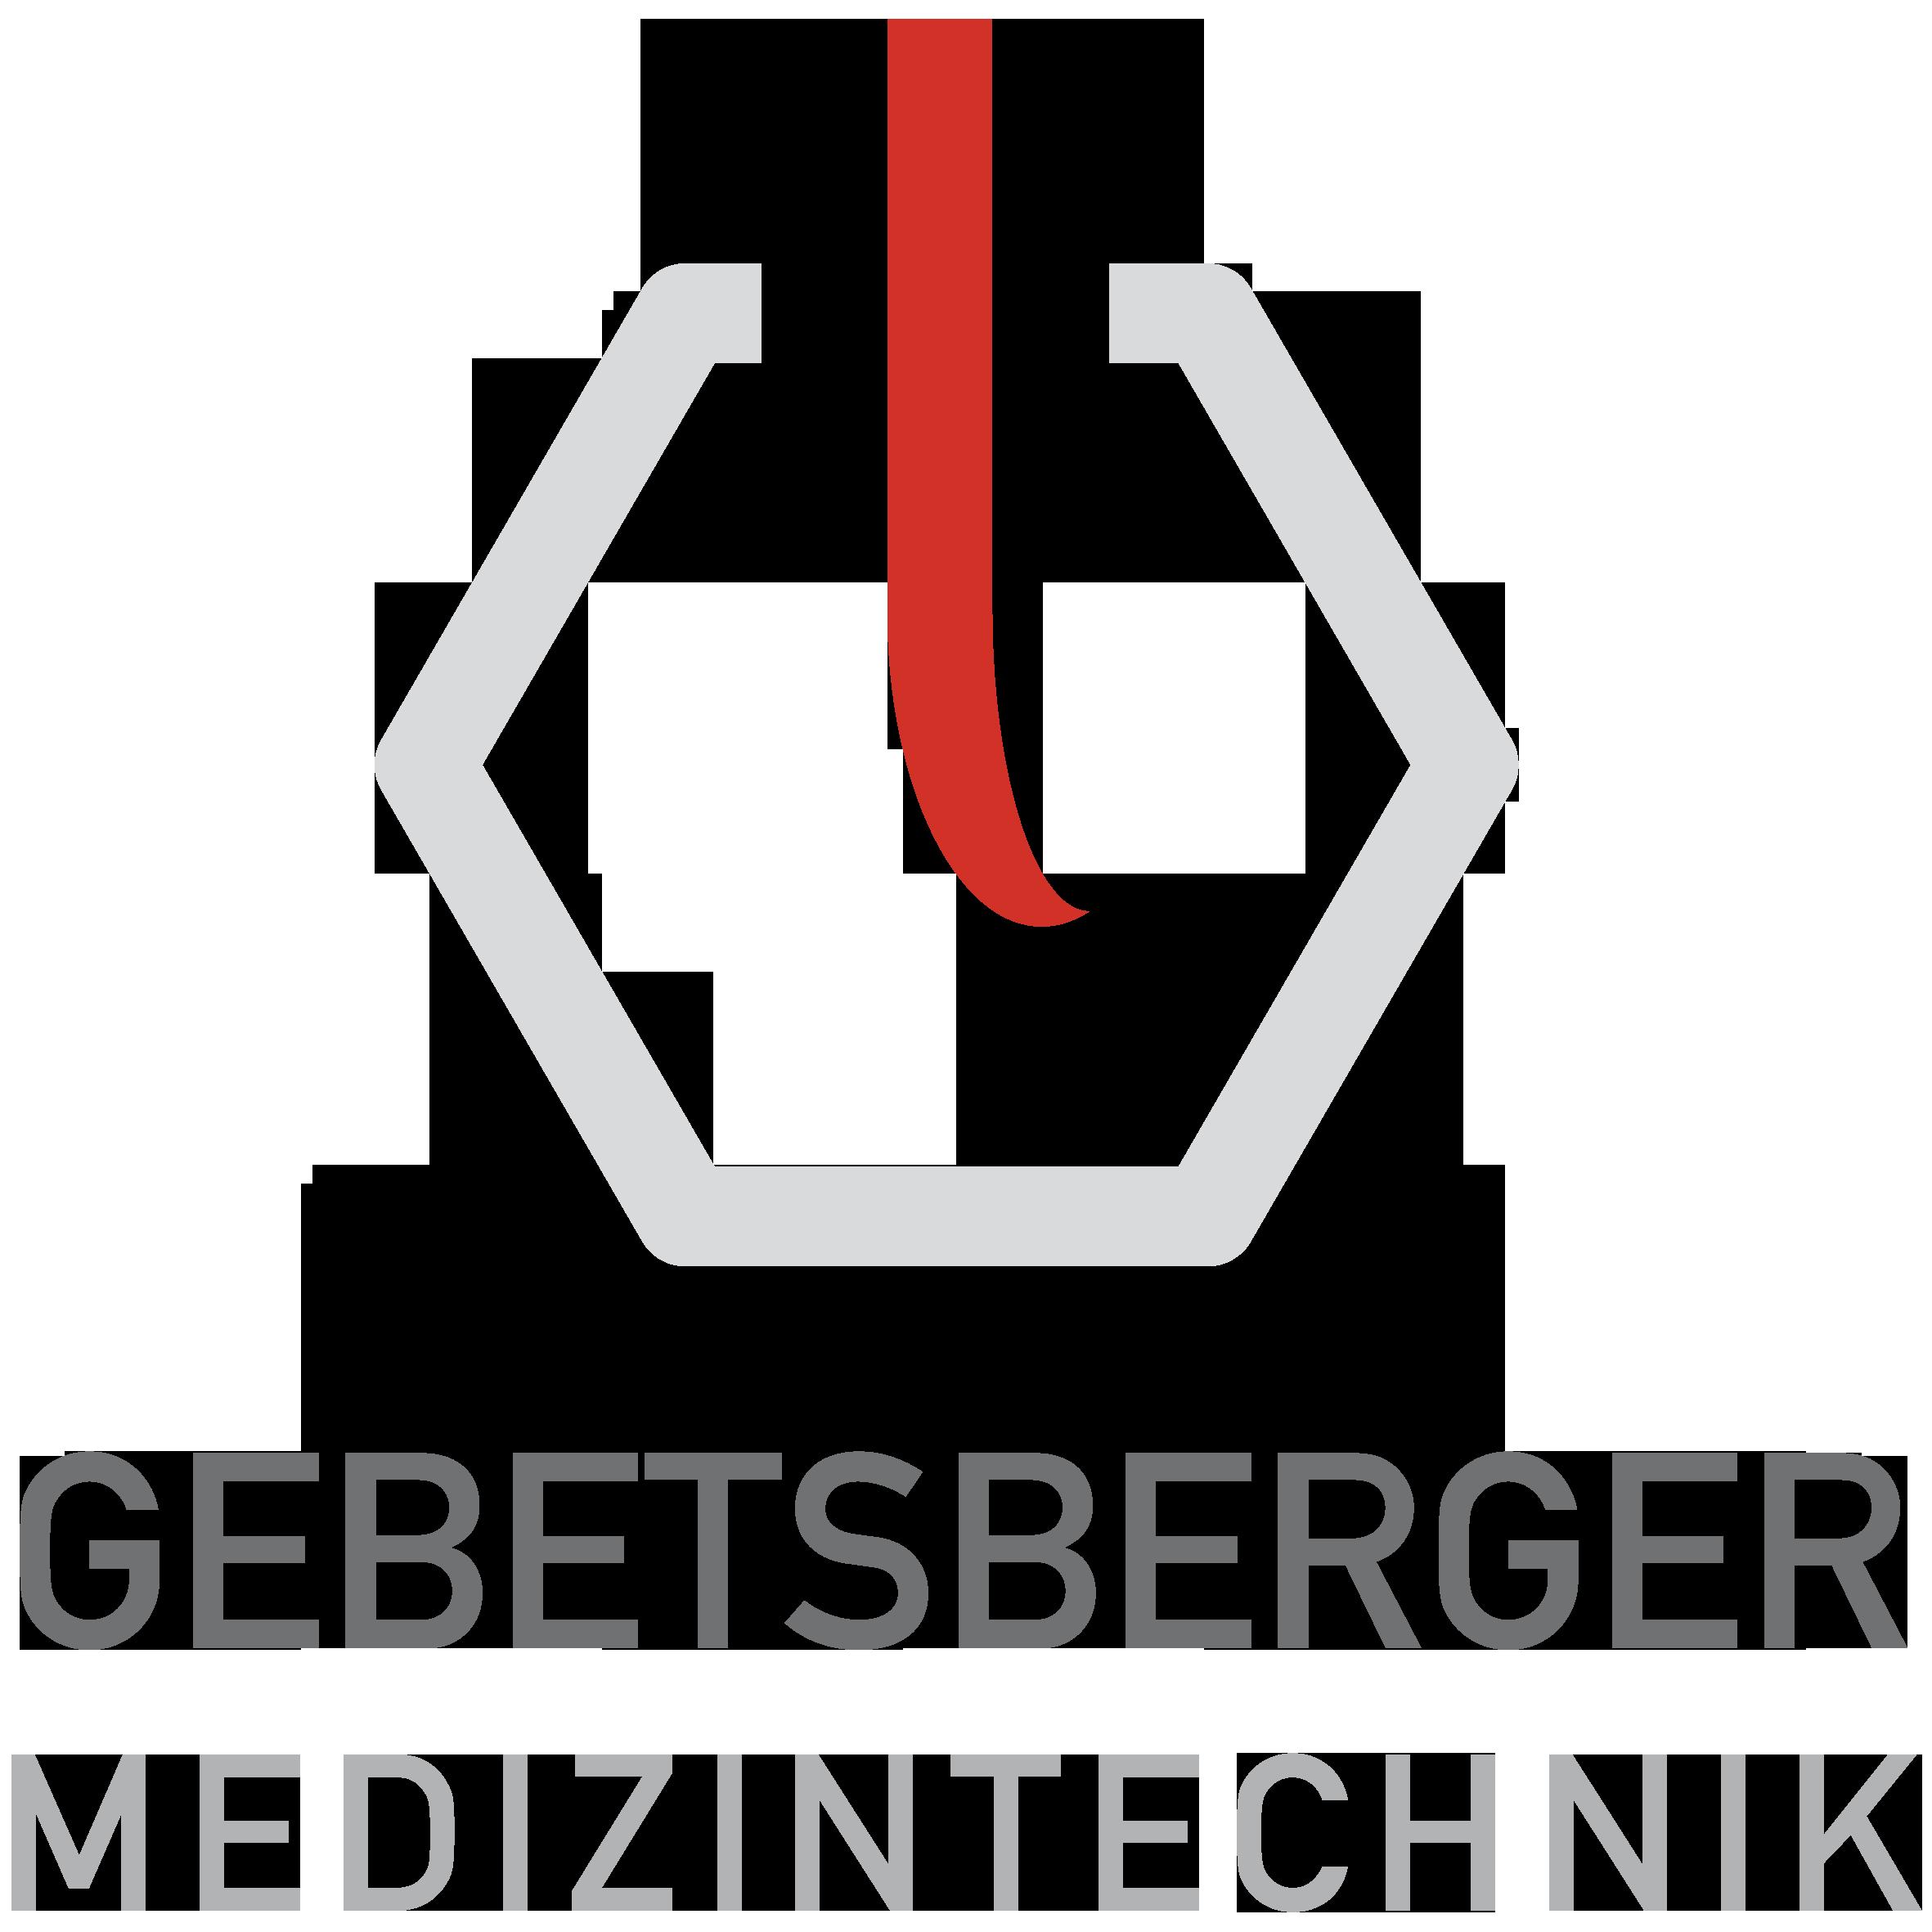 Gebetsberger Medizintechnik